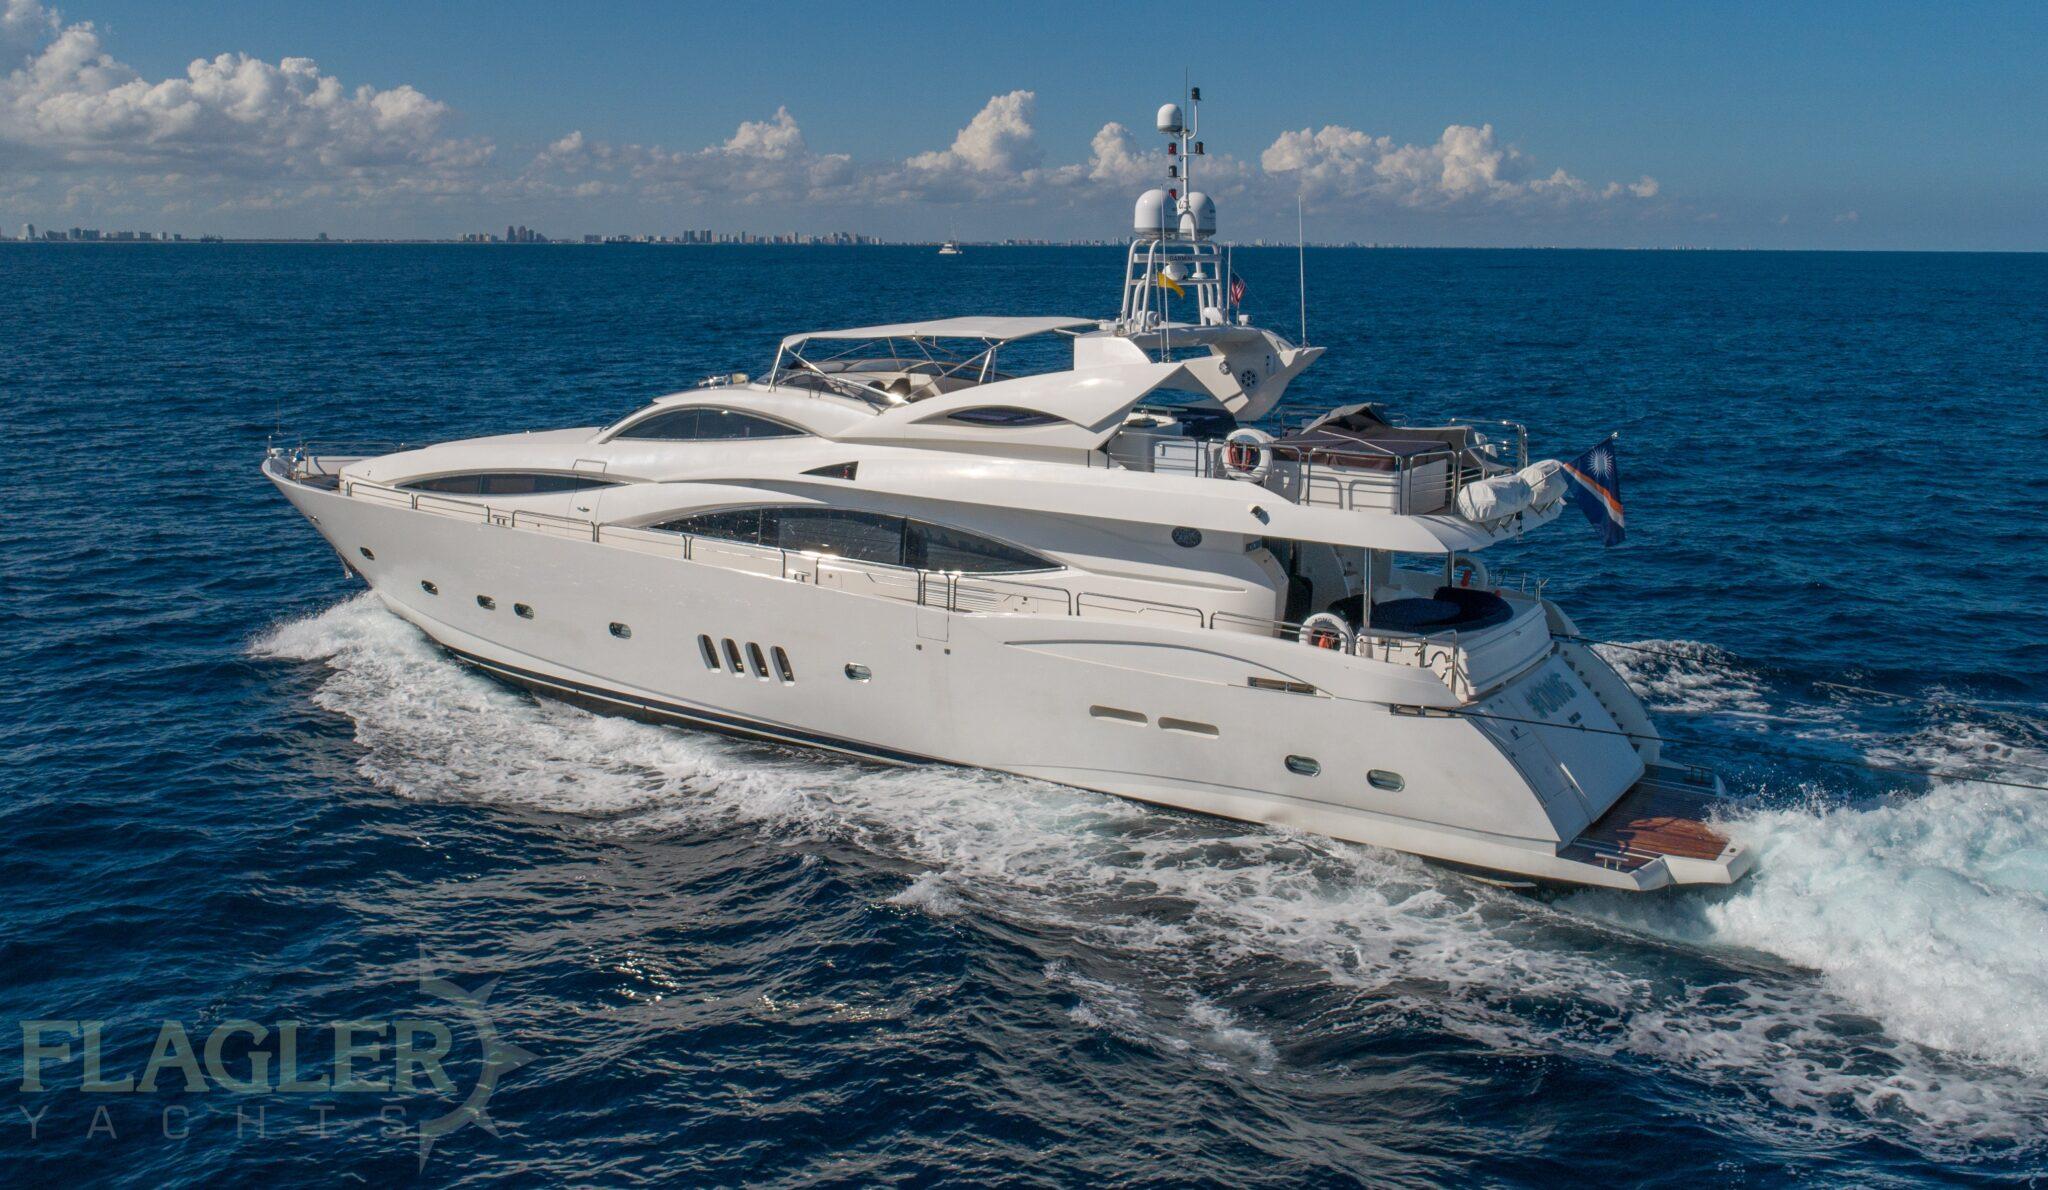 105 Sunseeker Motor Yacht for Sale, Flagler Yachts